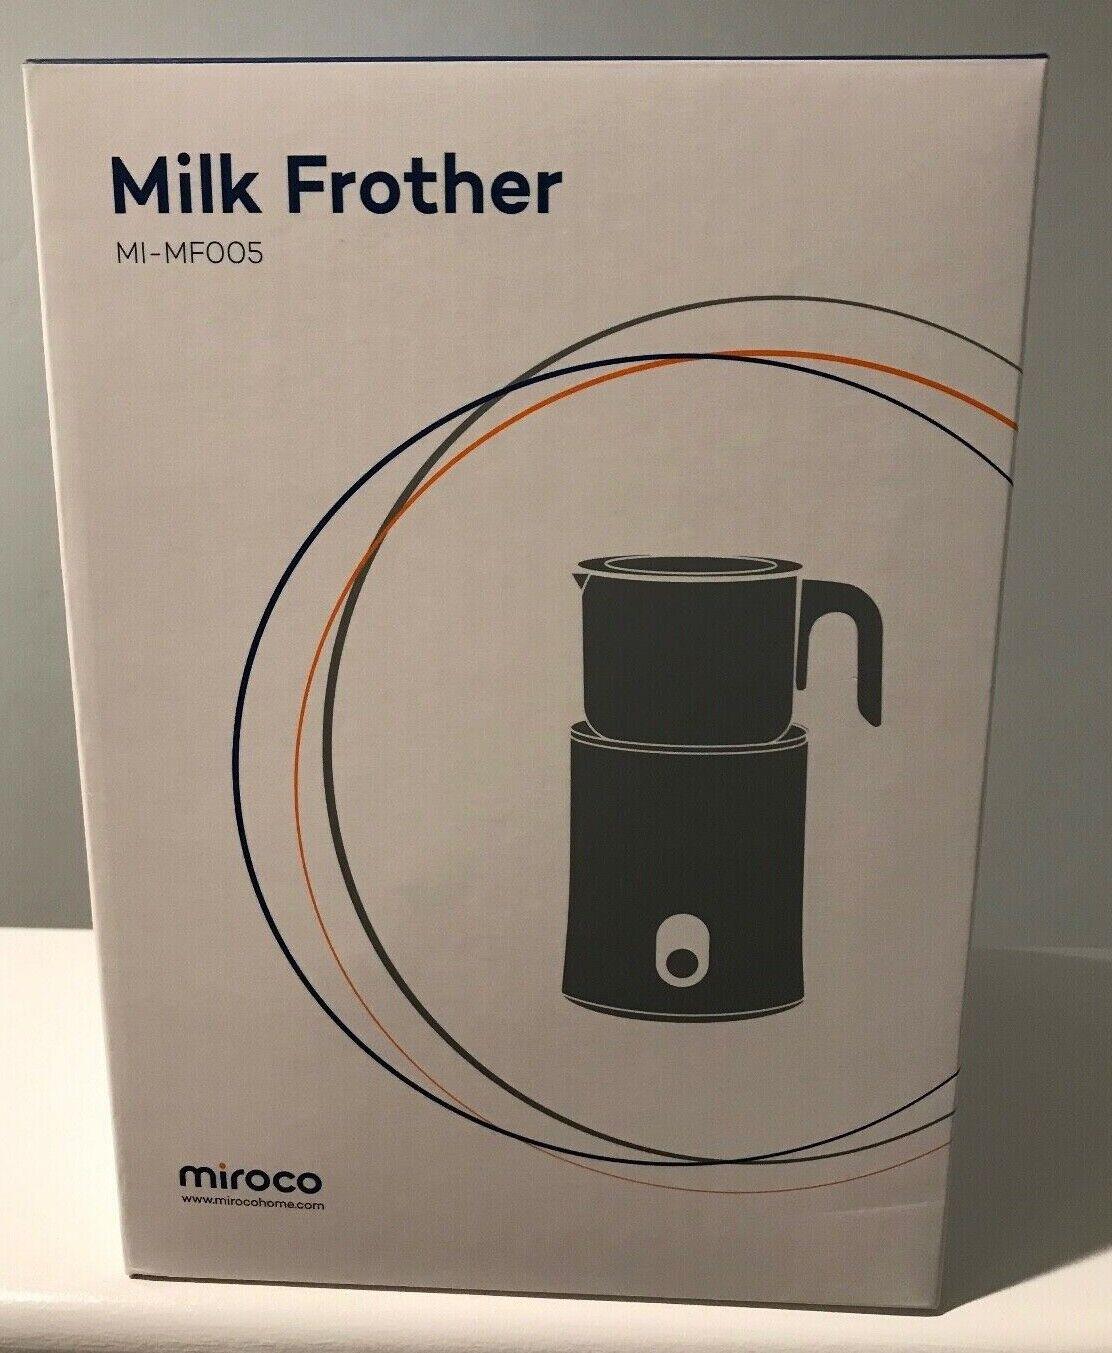 milk frother mi mf005 4 in 1